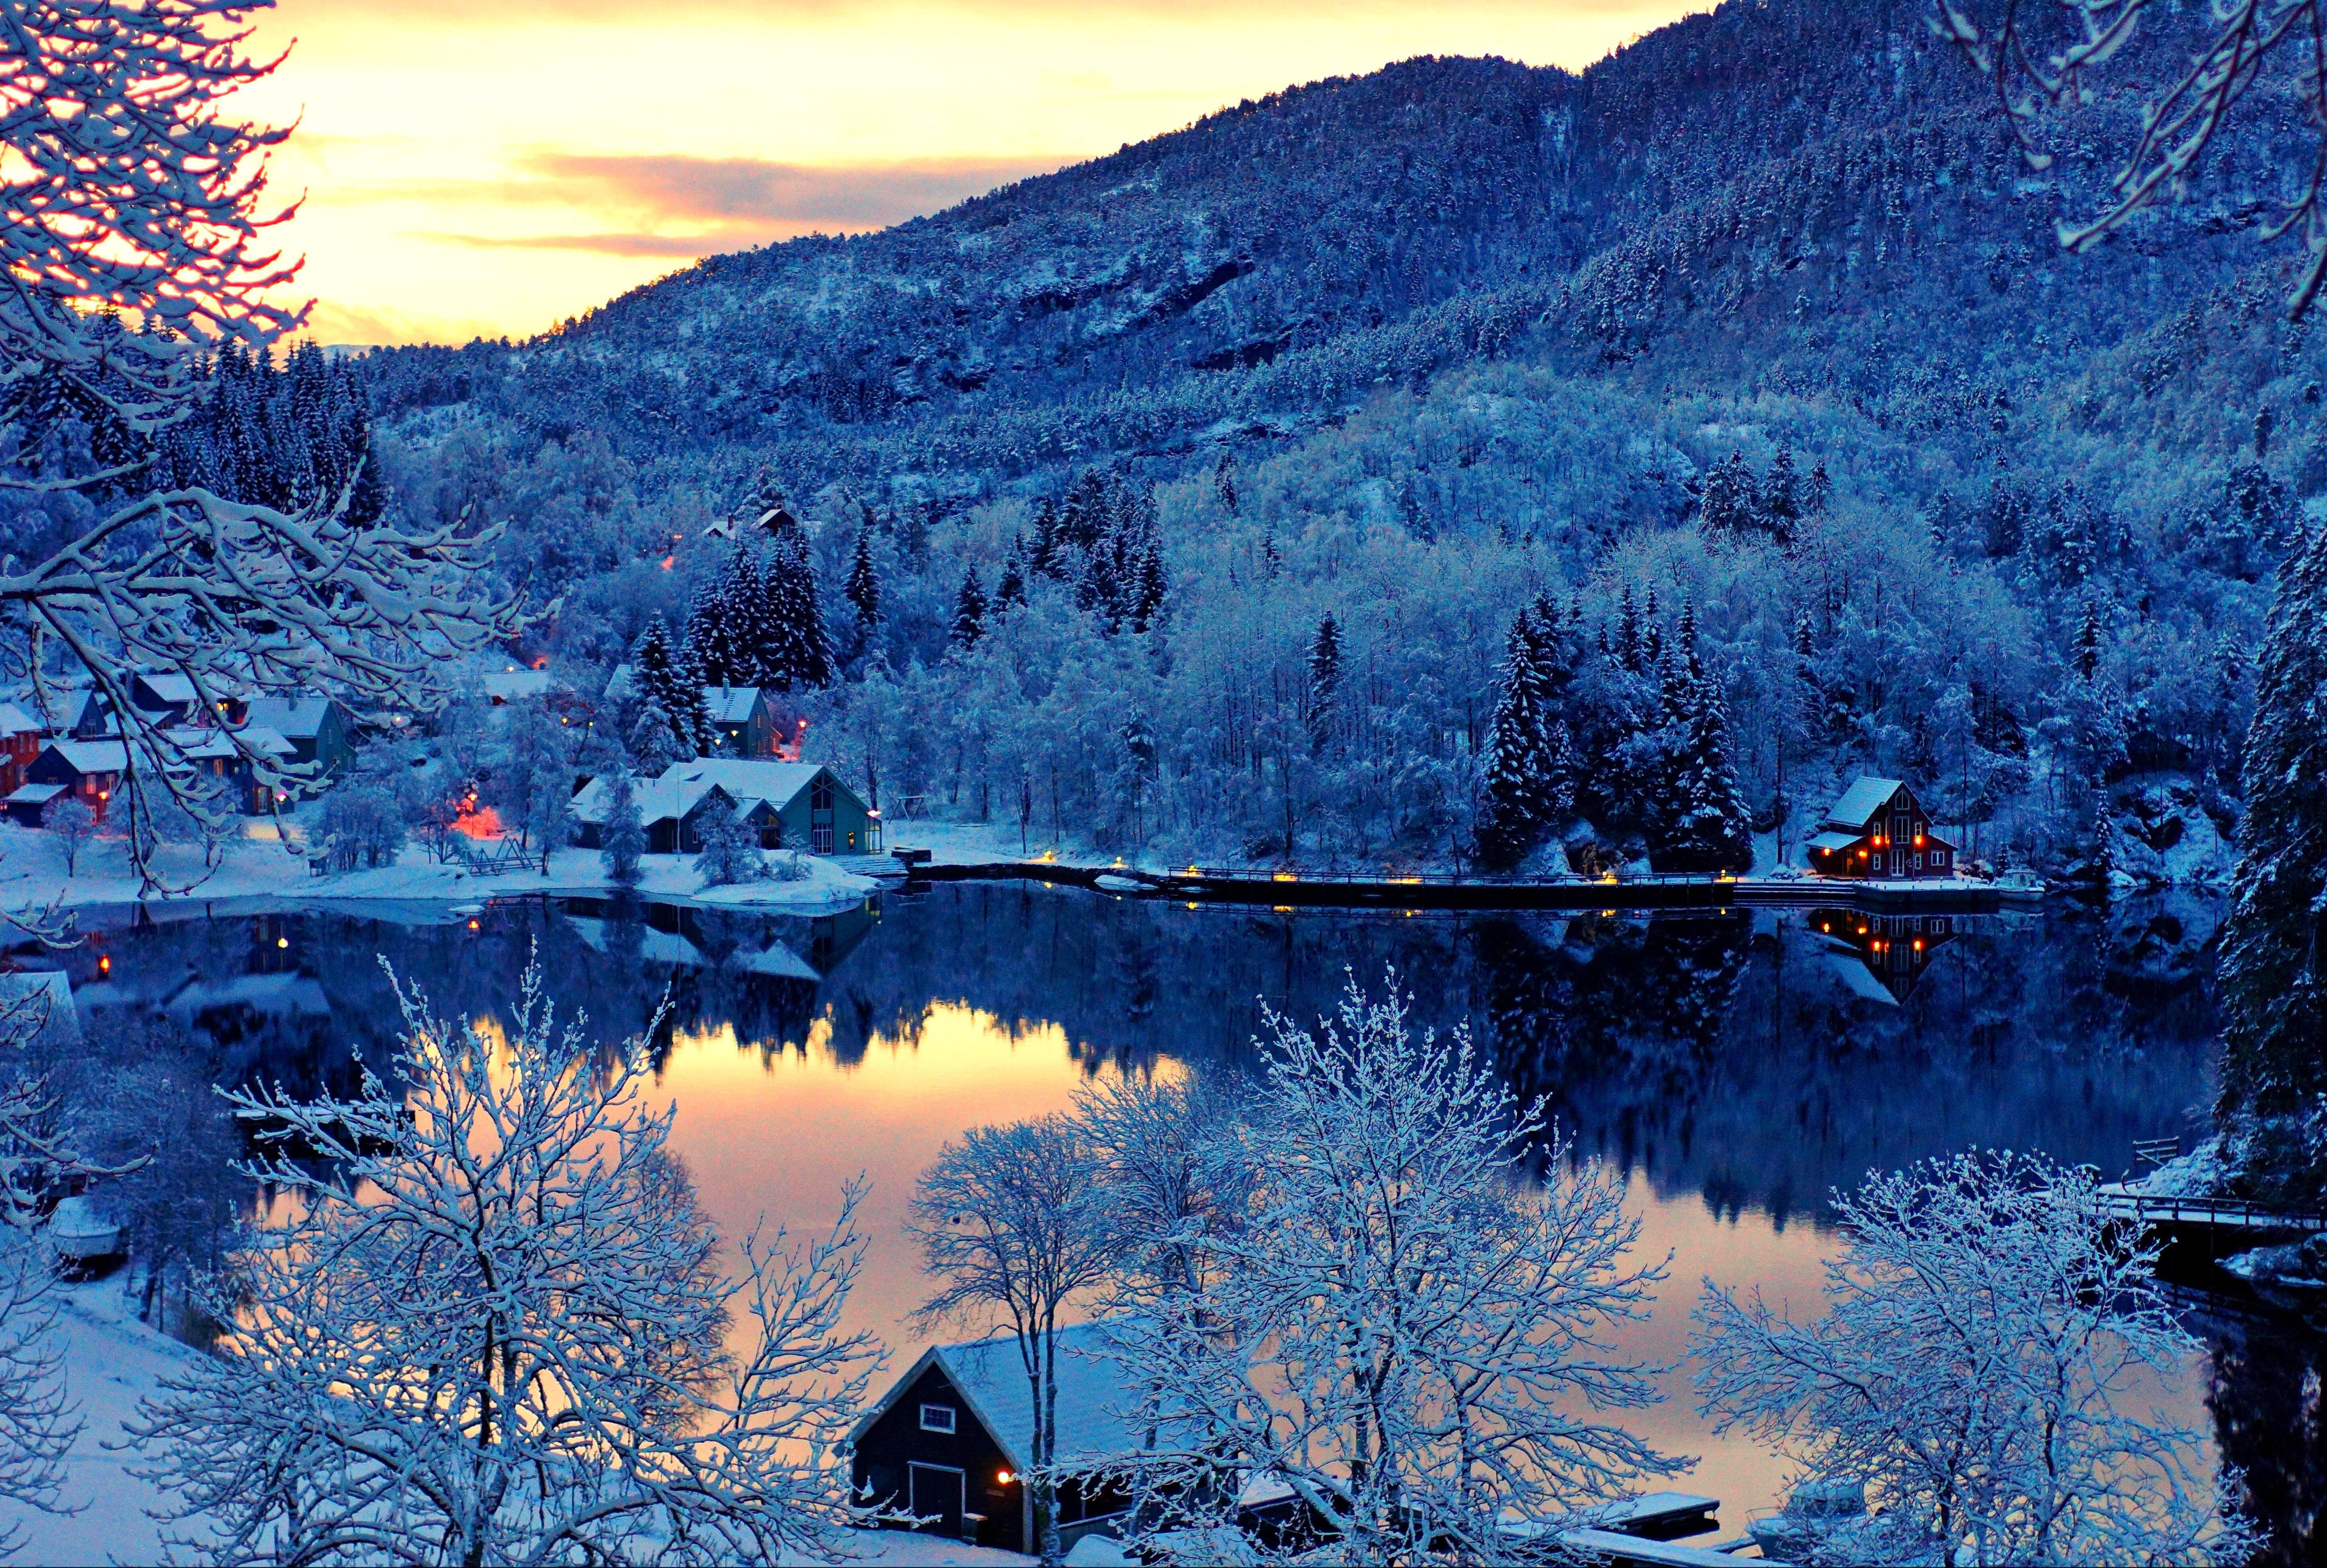 Обои месяц, финляндия. Природа foto 16